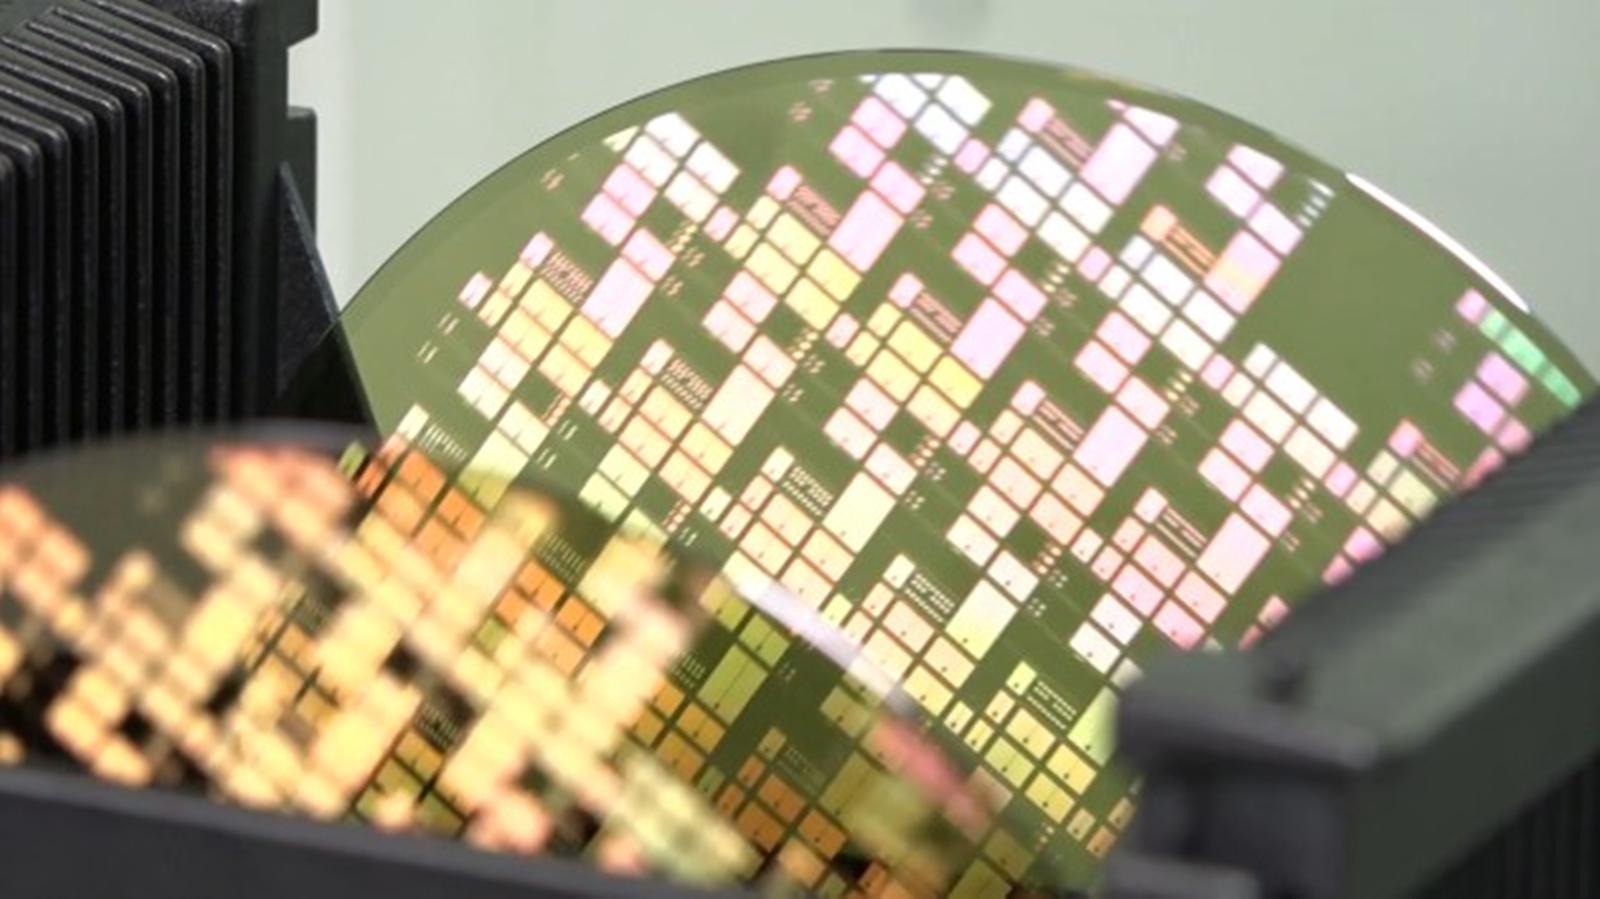 Microchips Sic Bosch (1)